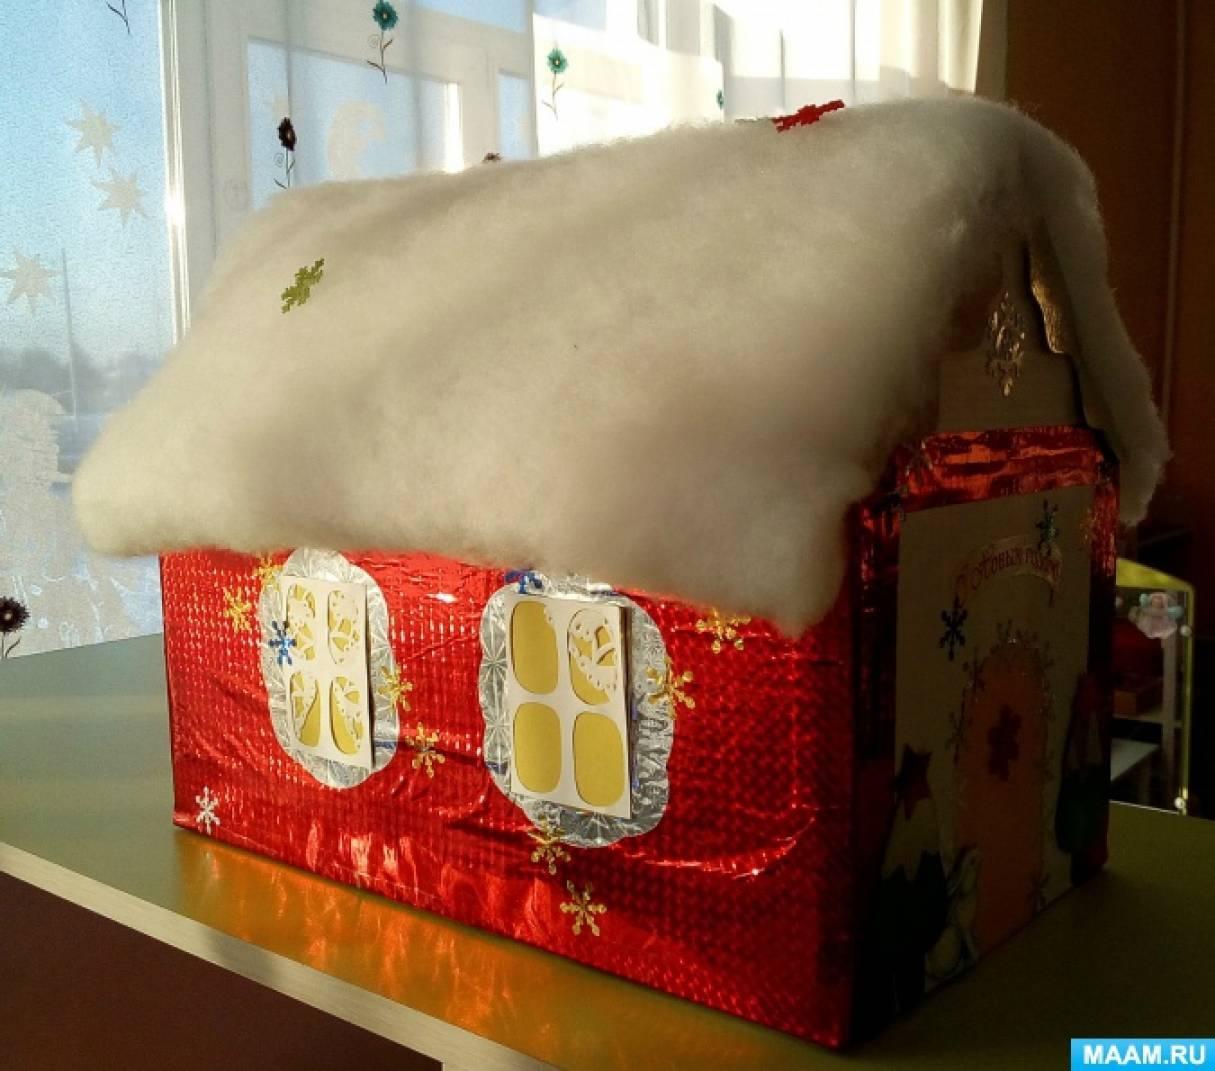 Мастер-класс «Новогодний домик из коробки»